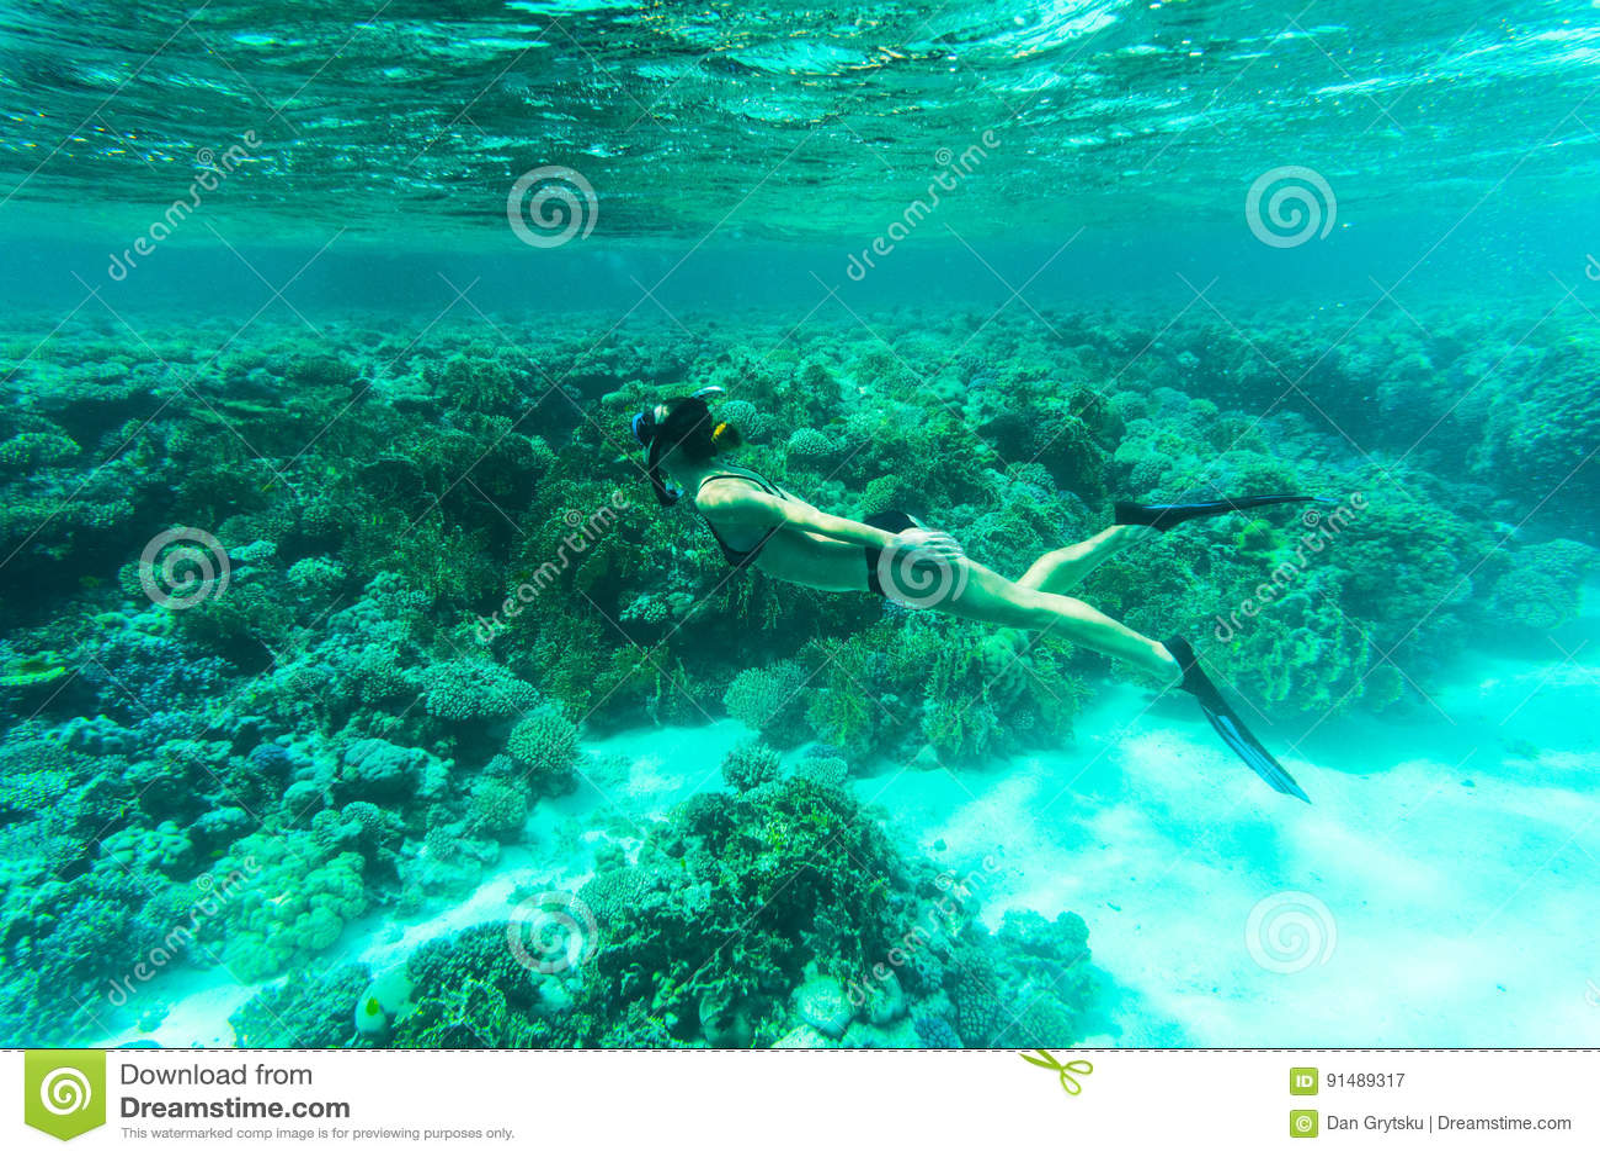 Beautiful Woman snorkeler explores coral reef in sea water